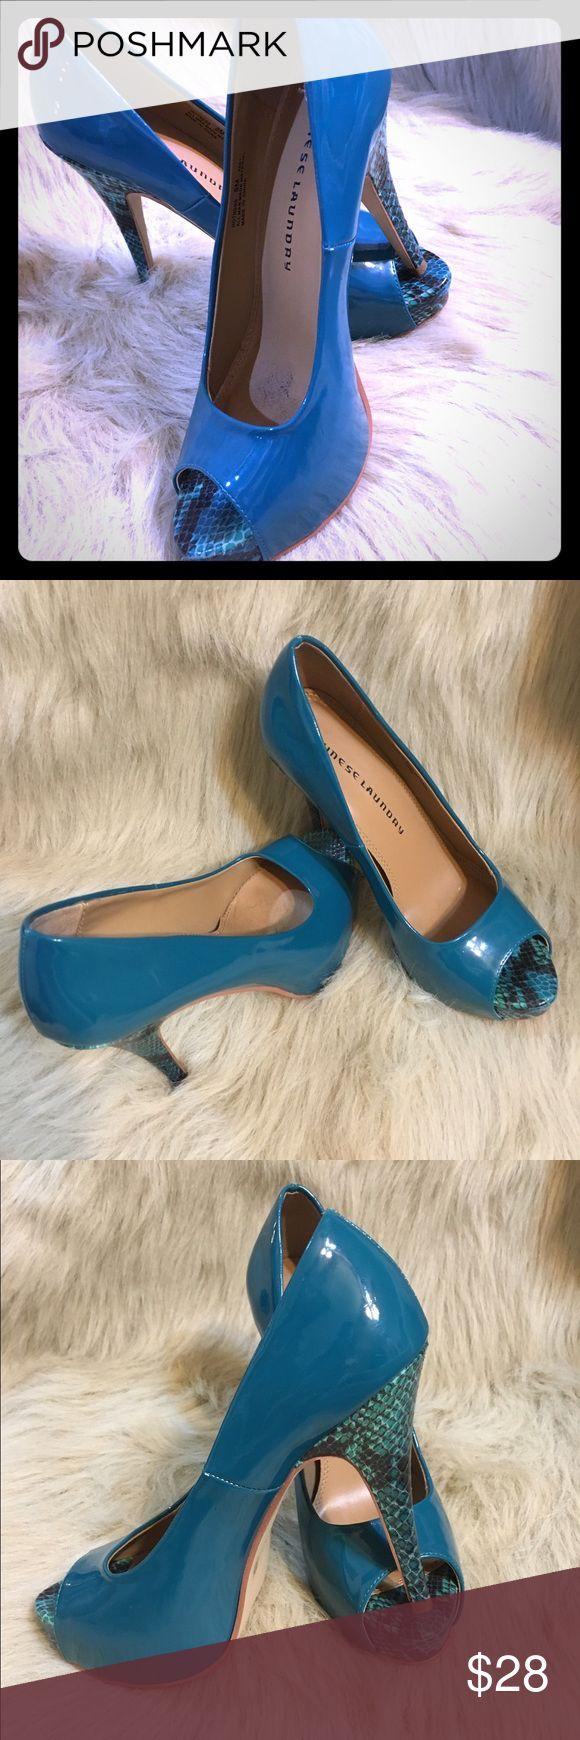 chinese laundry  heels chinese laundry Beautiful turquoise  heels shoes chinese laundry  Shoes Heels